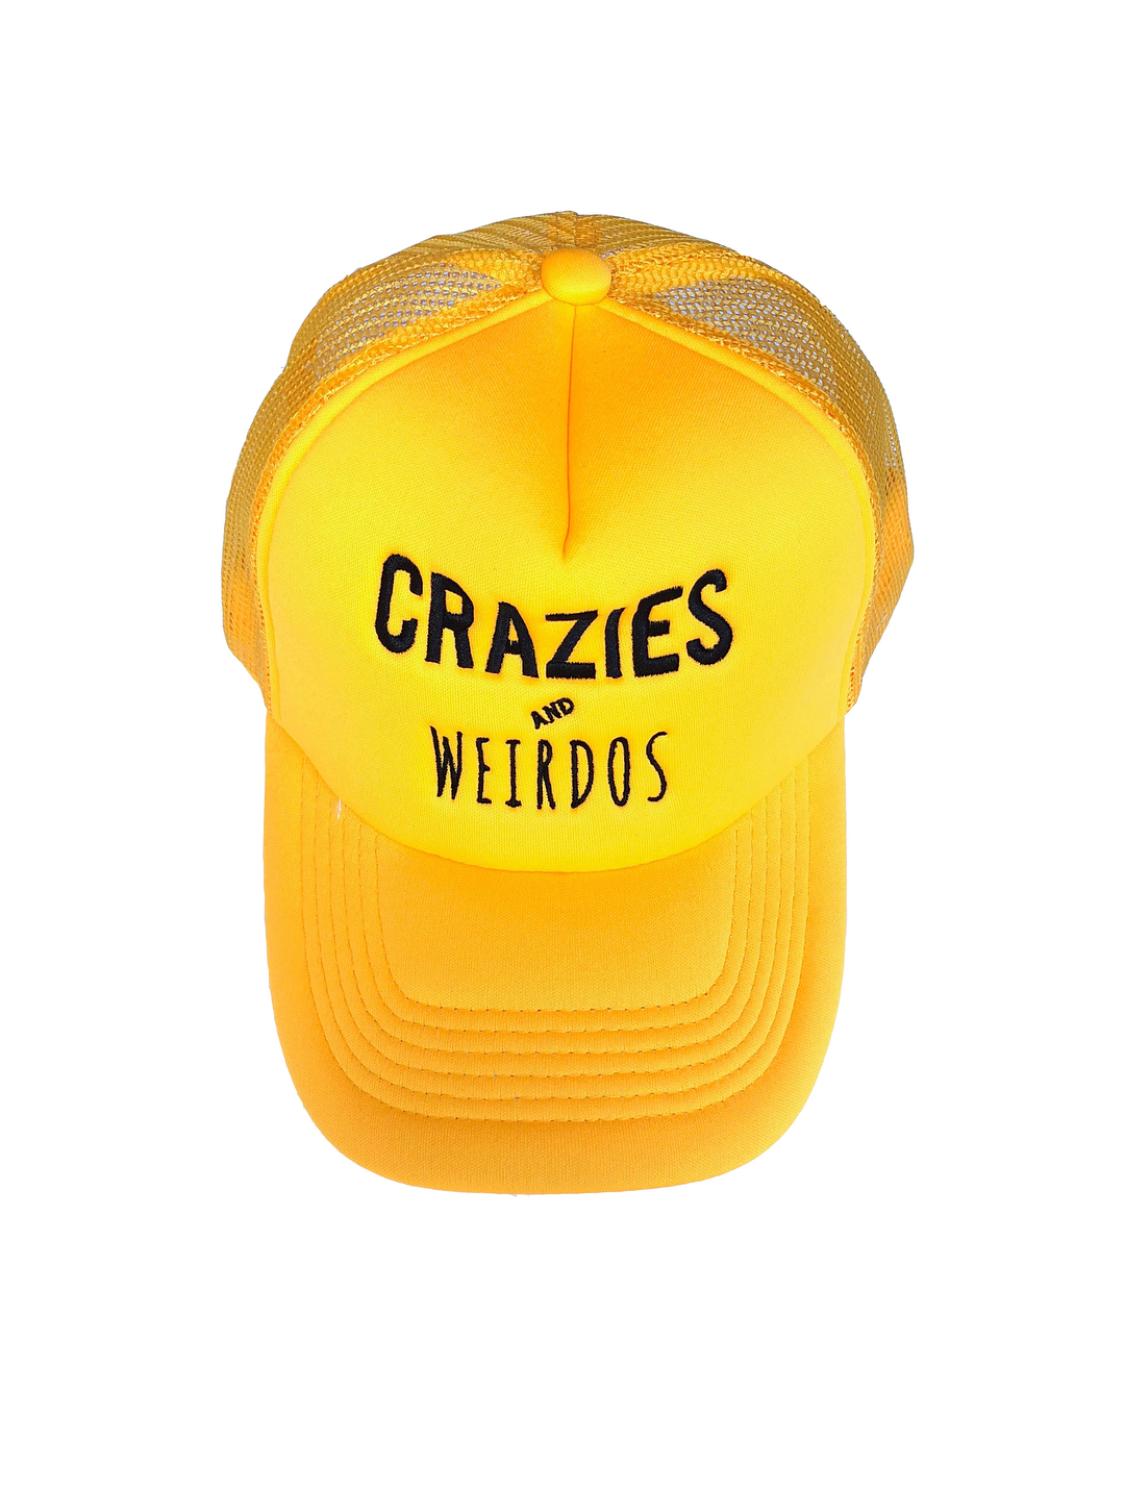 Crazies and weirdos